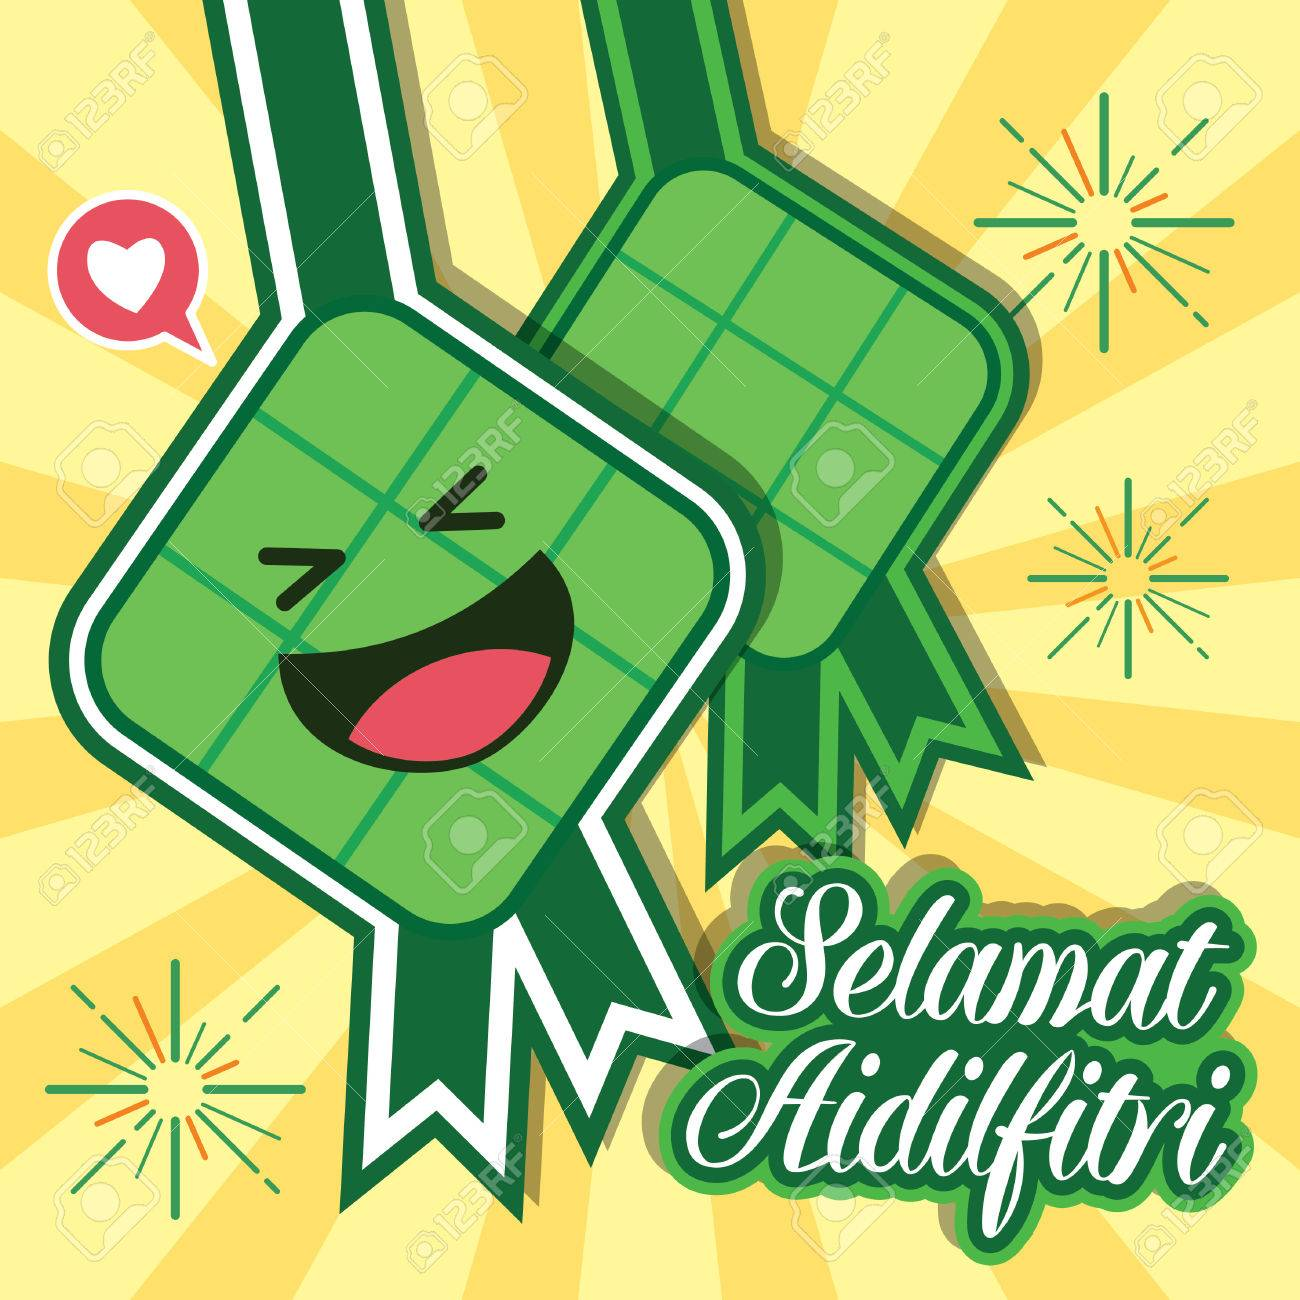 Hari Raya Aidilfitri vector illustration with cute ketupat. Caption: Fasting Day of Celebration - 77669948